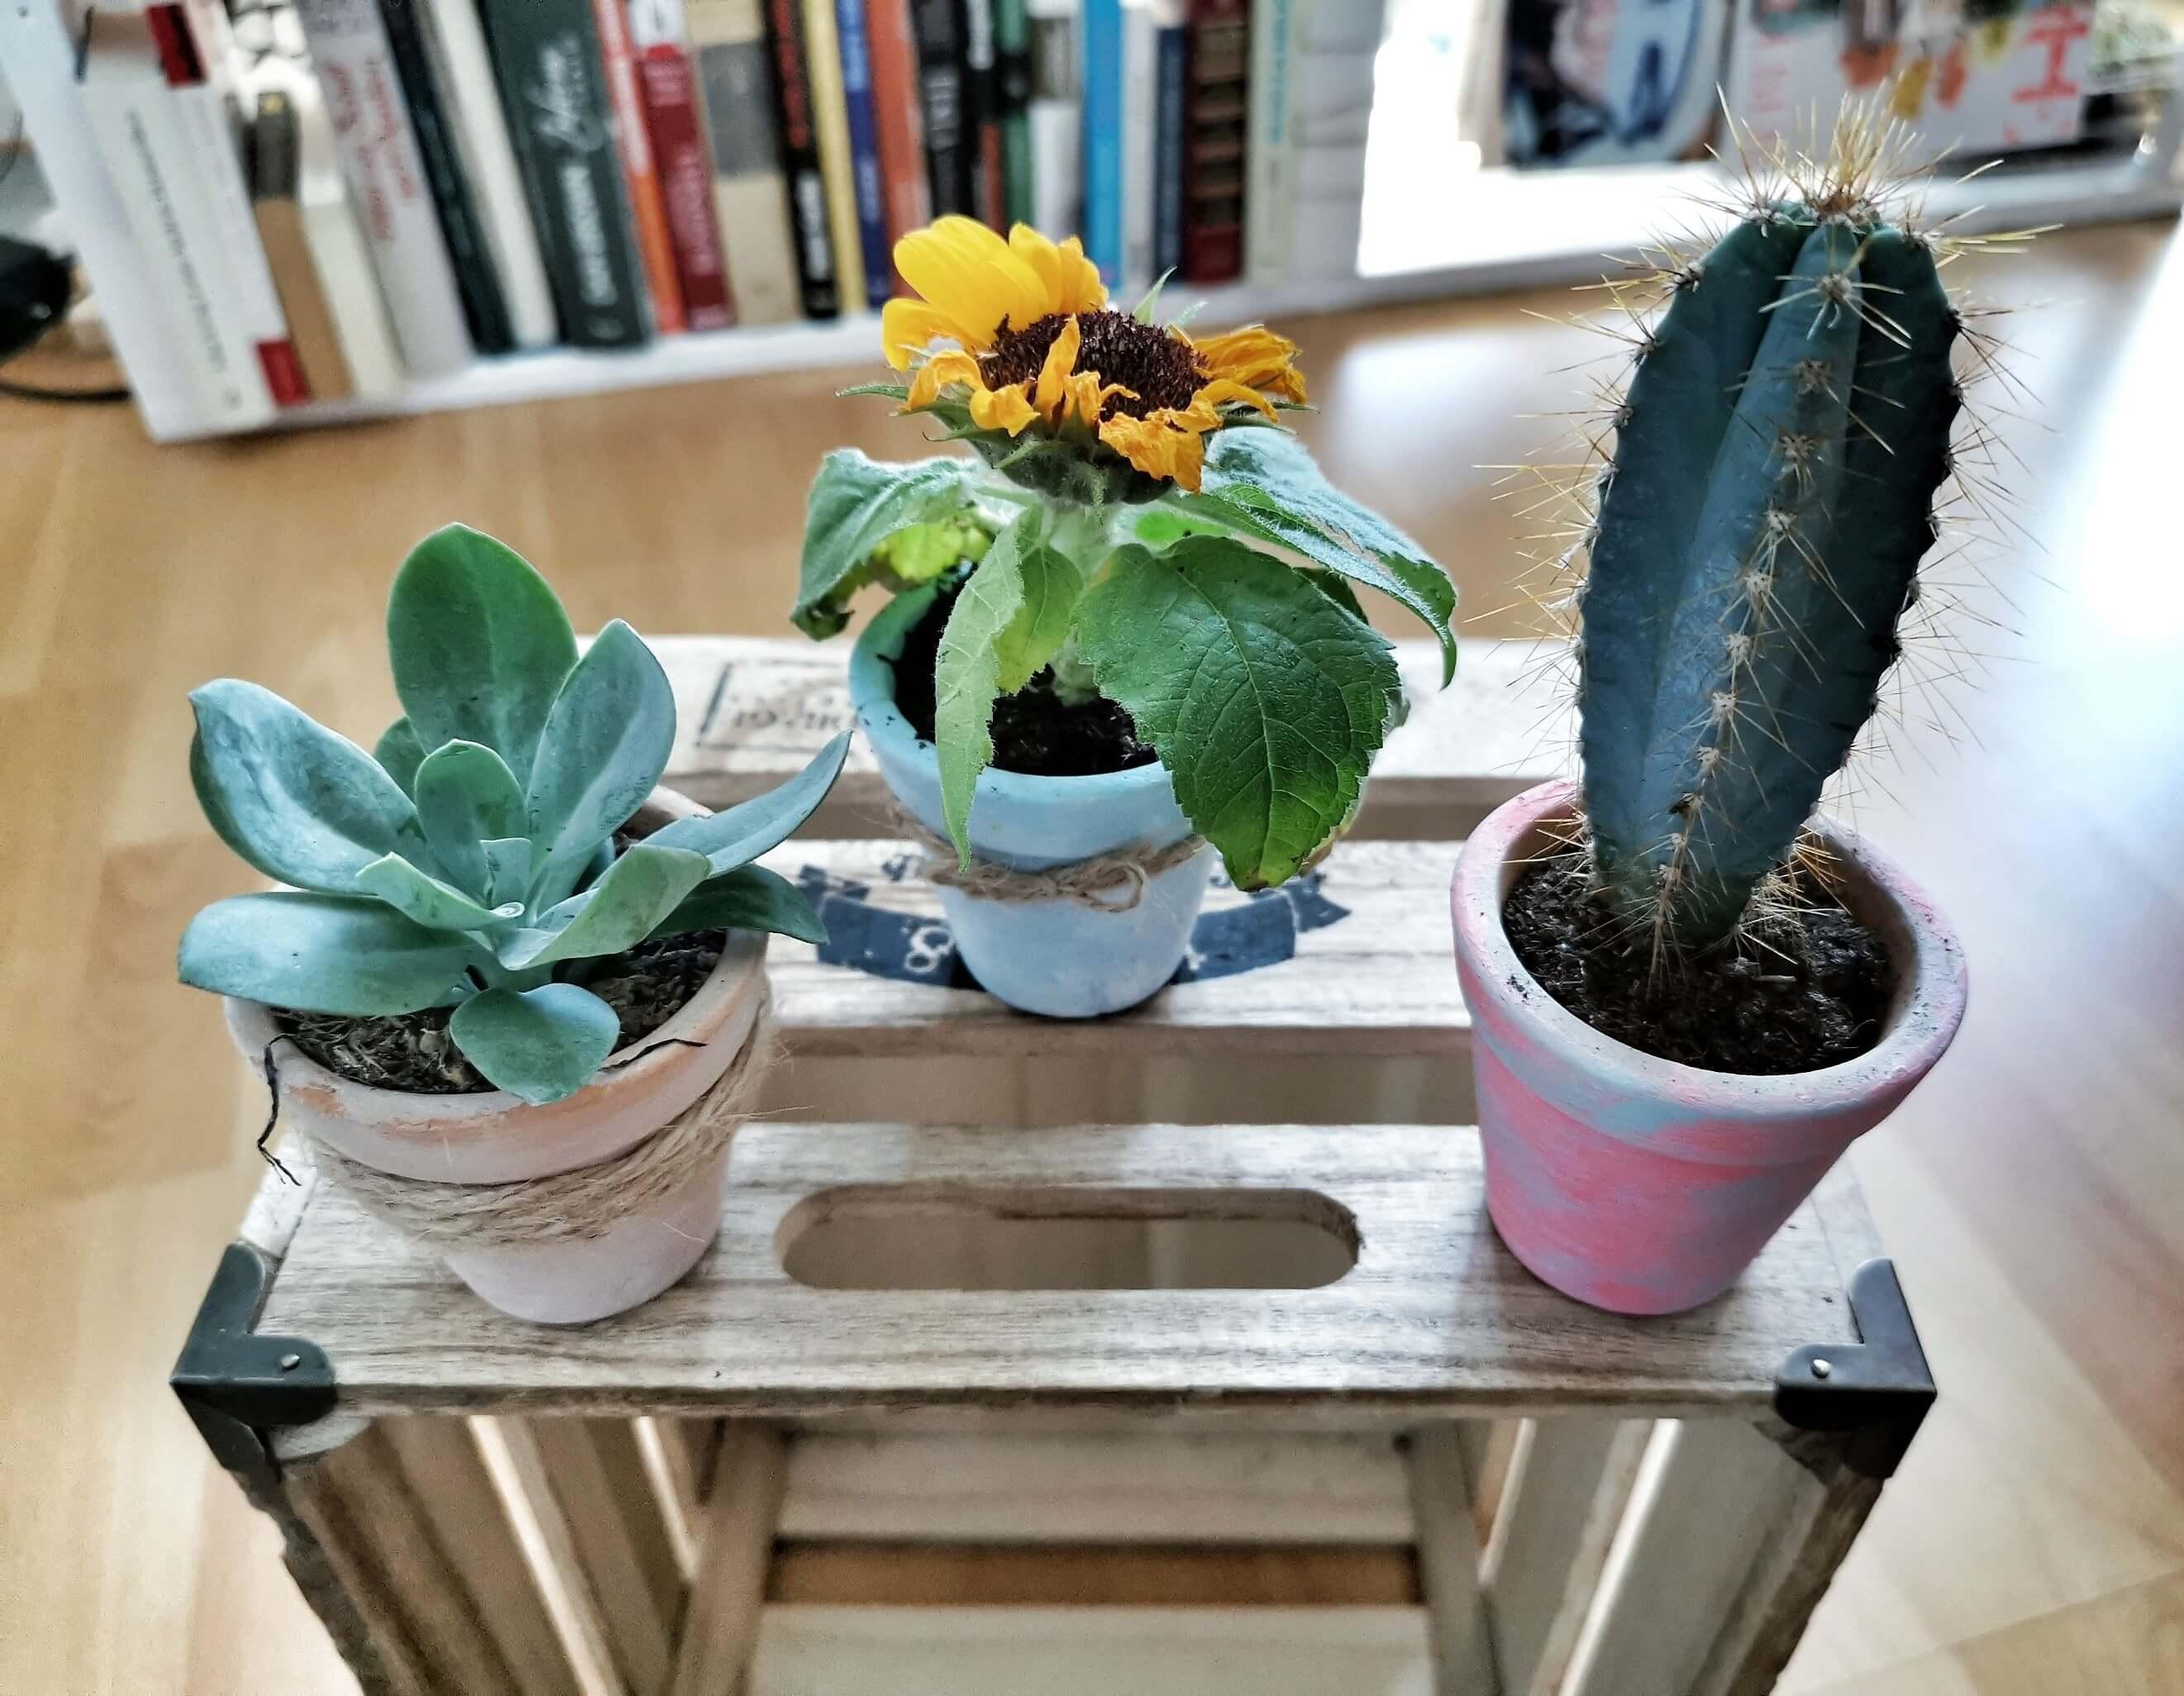 IMG 20190612 130914 01 resized 20190612 062904895 - Kreatives Recycling: Blumentöpfe in 5 verschiedenen Stilen